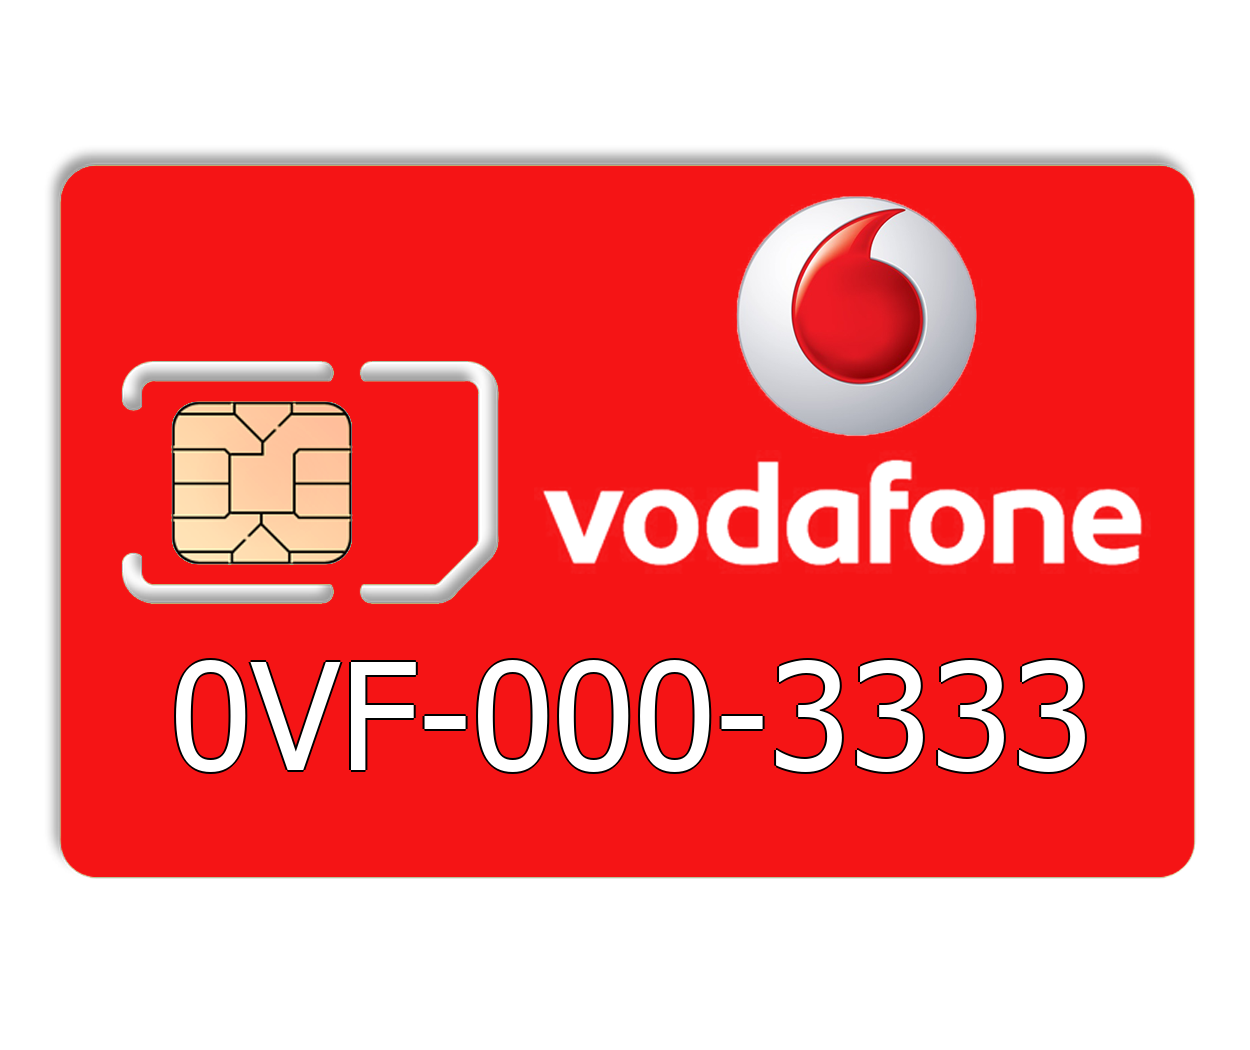 Красивый номер Vodafone 0VF-000-3333